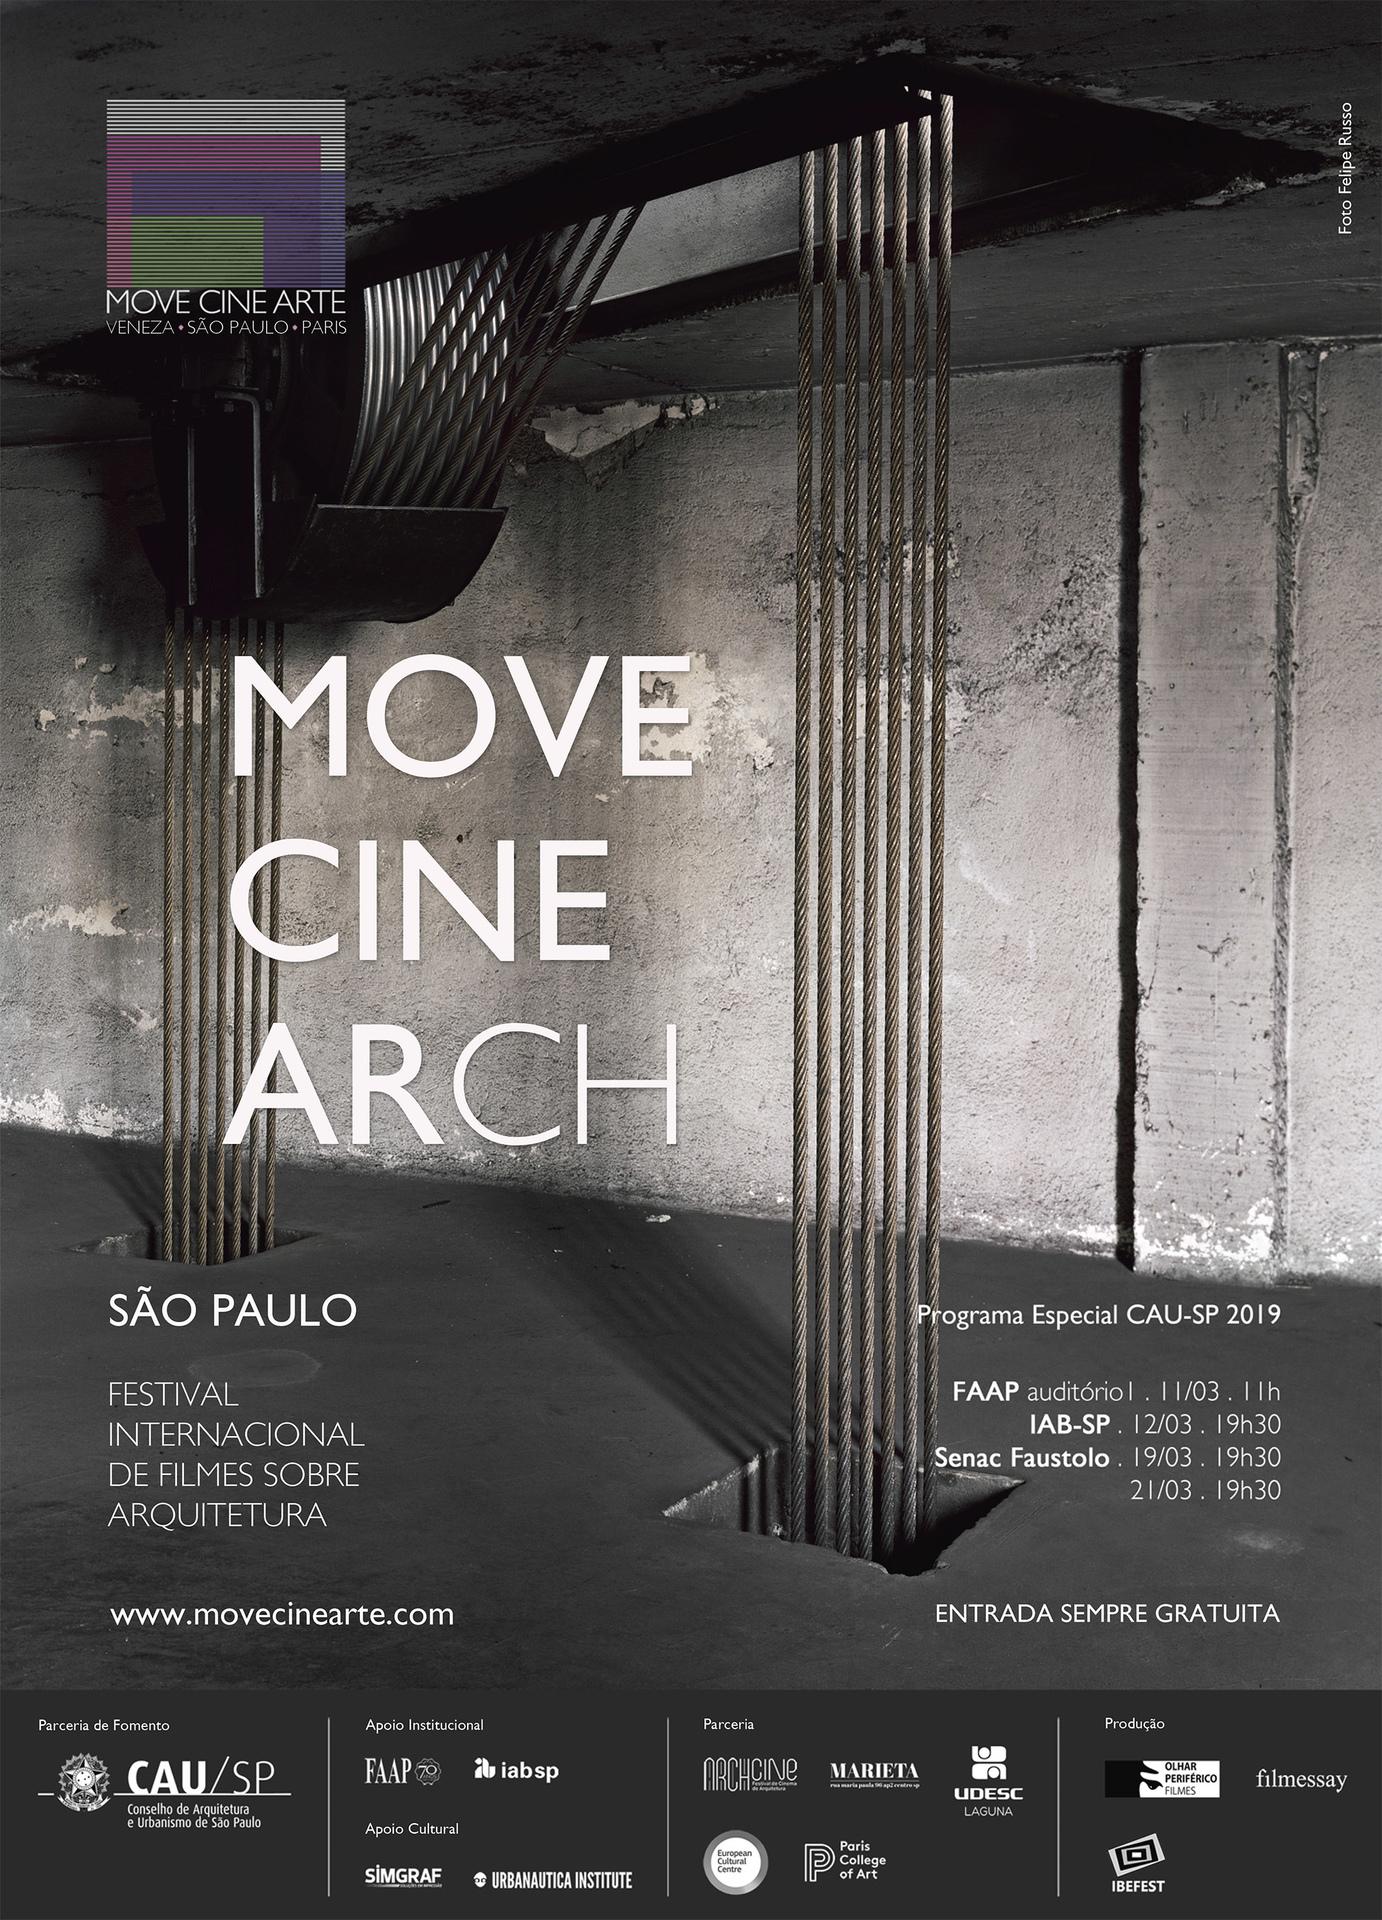 6851706sv78iQ8 - MOVE CINE ARCH - 2019